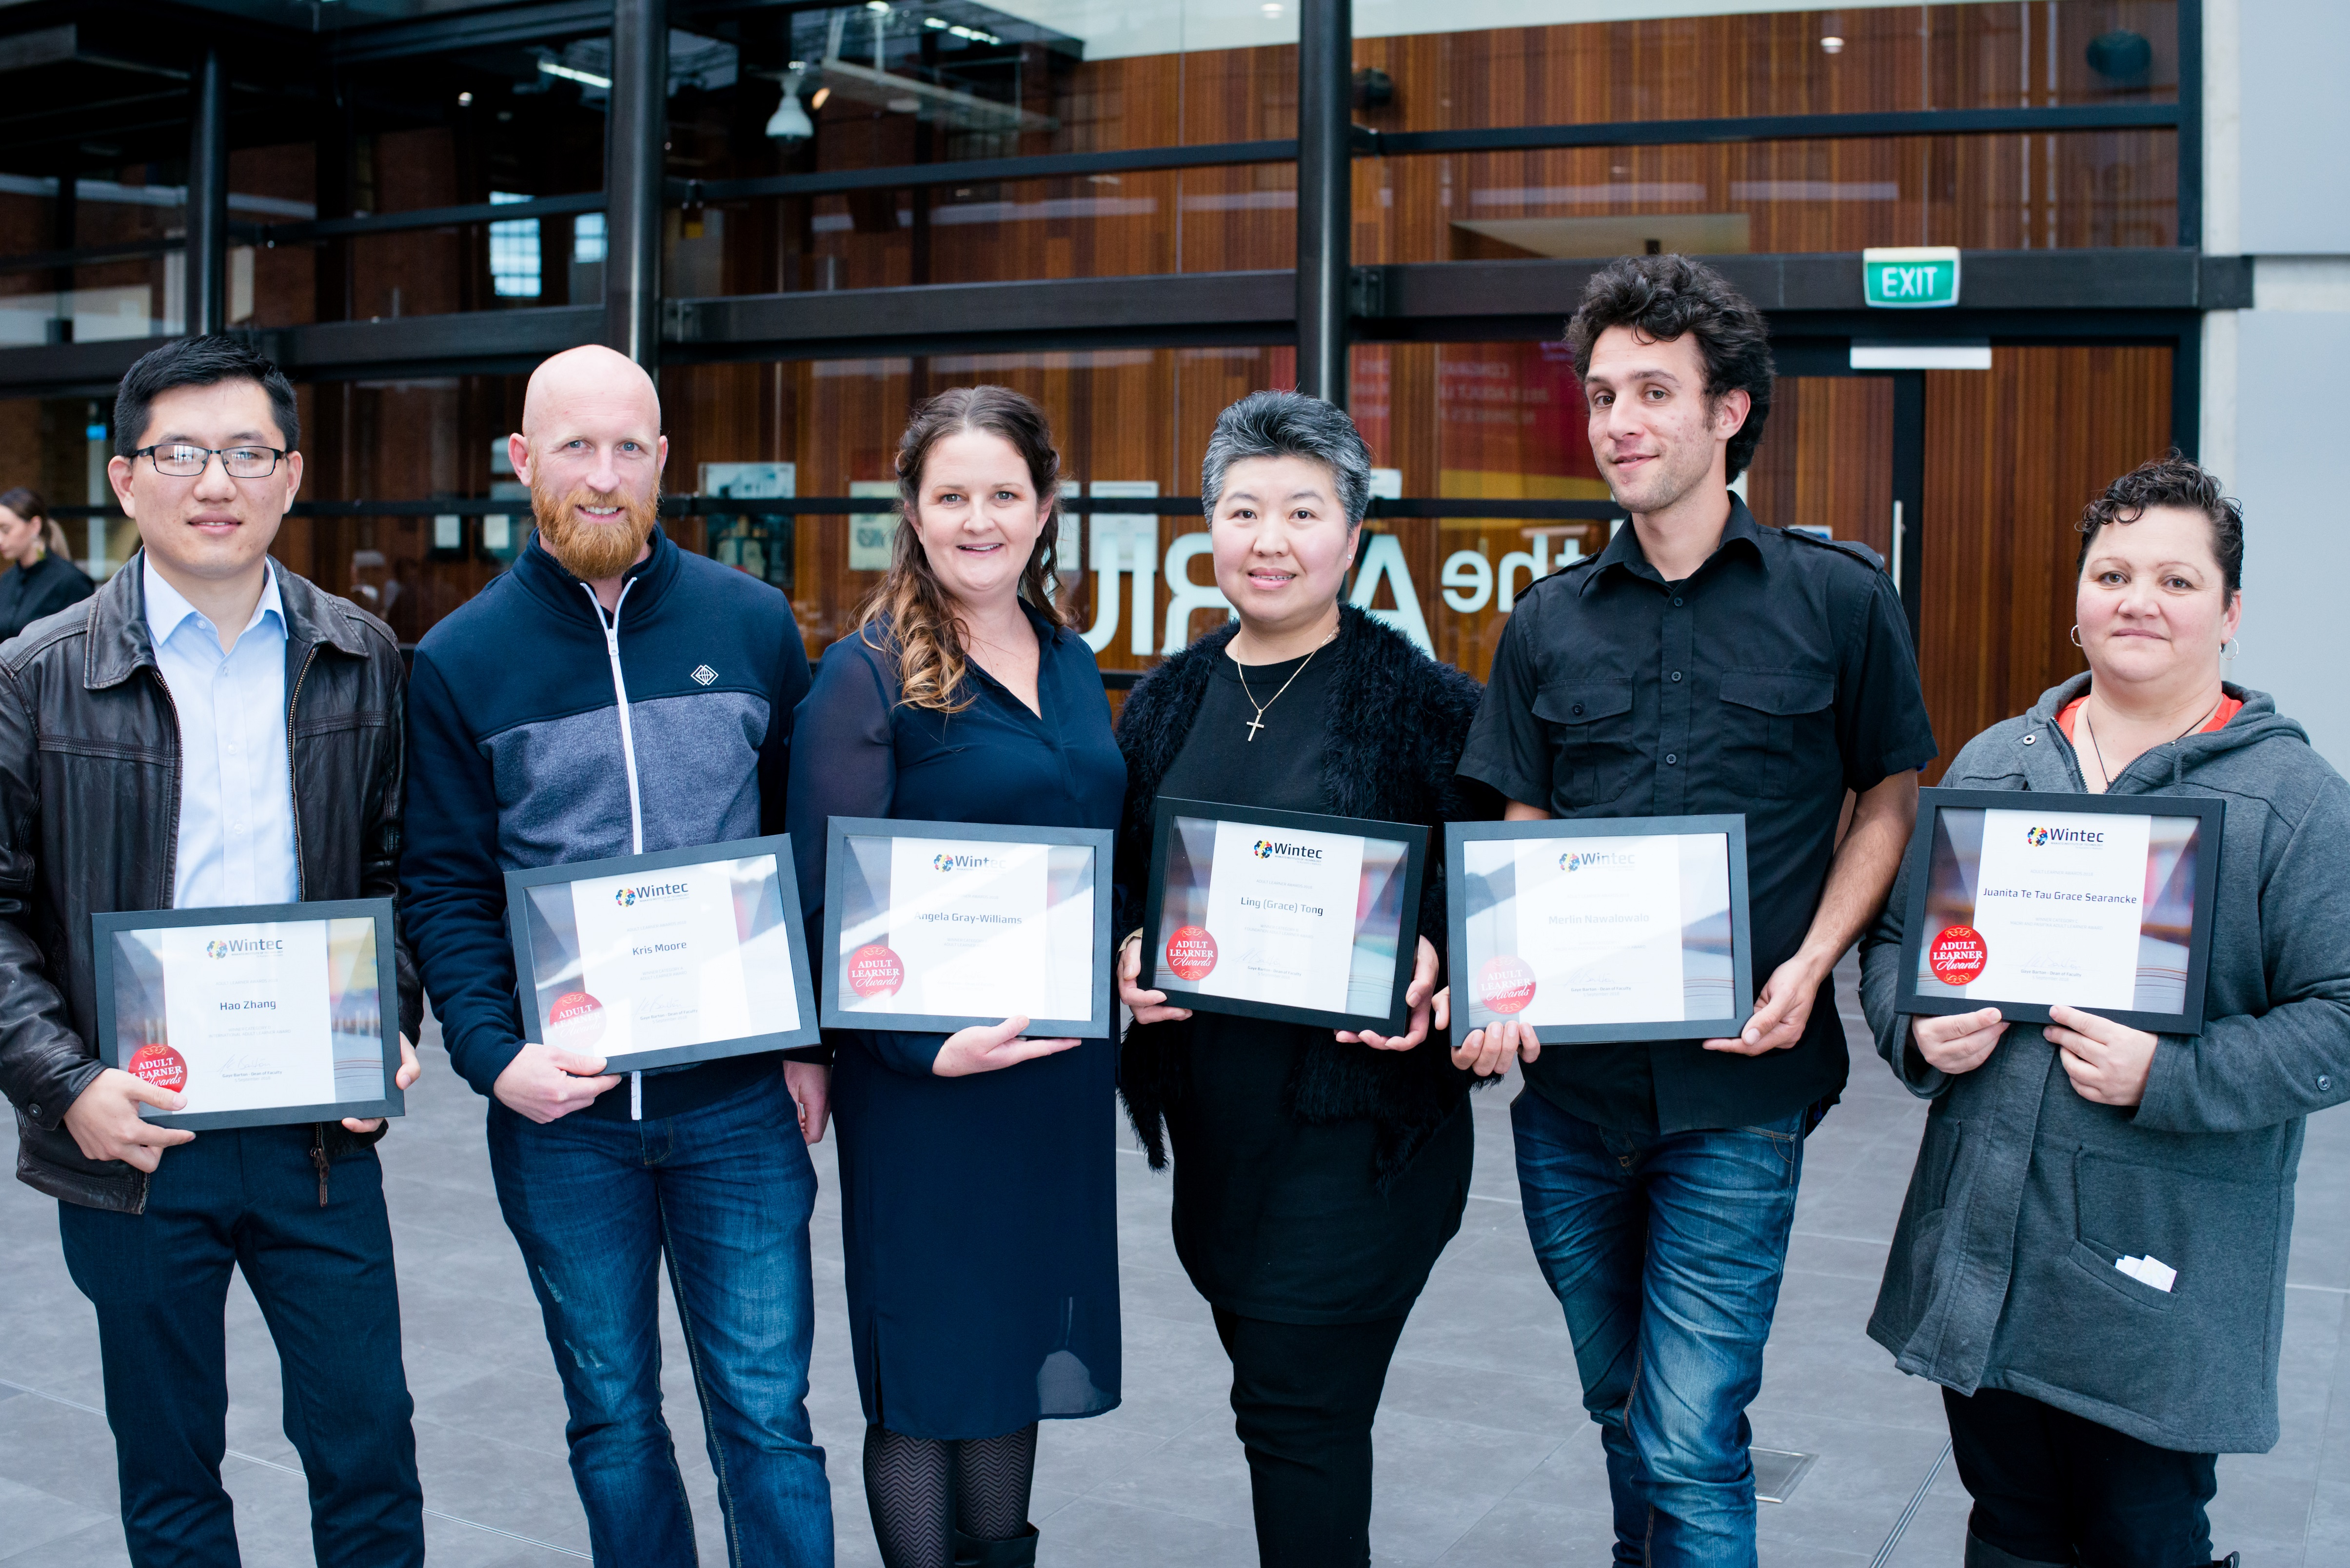 Wintec Student Learner Awards 2018 Winners